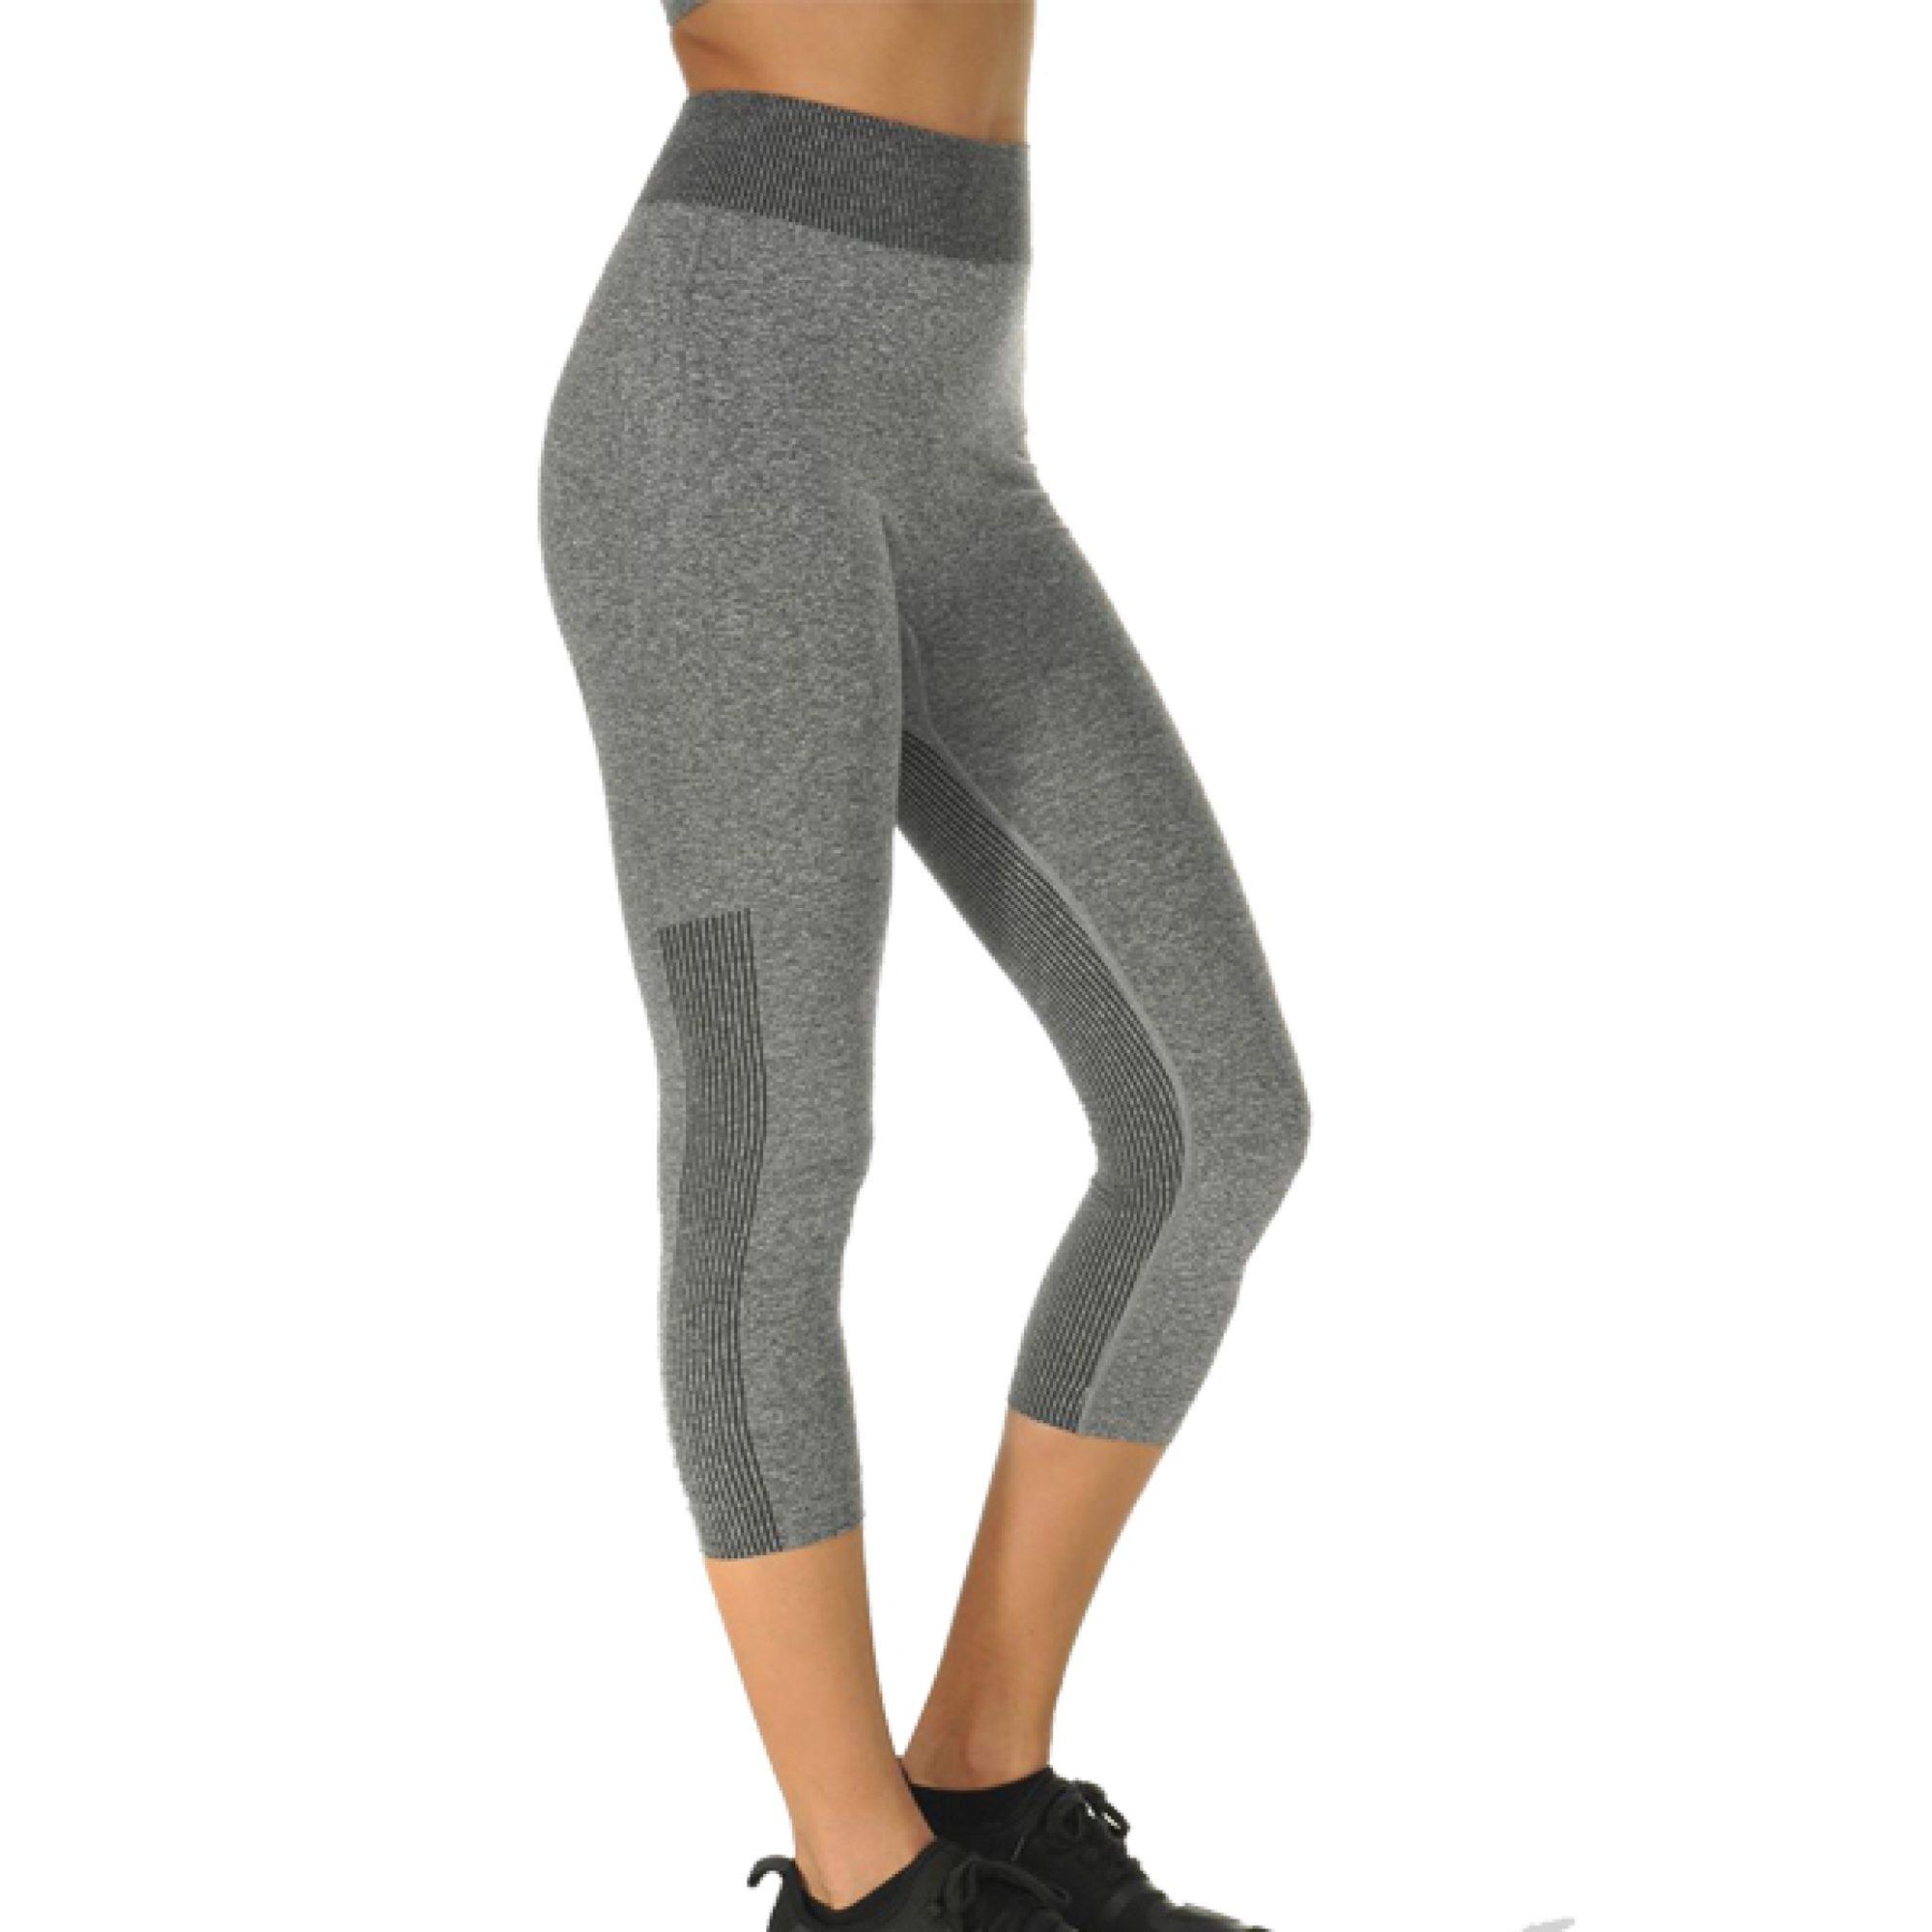 73c3798a0fd6 Αθλητισμός   Γυναικεία   Ρούχα   Body Talk Tight (172-907206-Drk ...